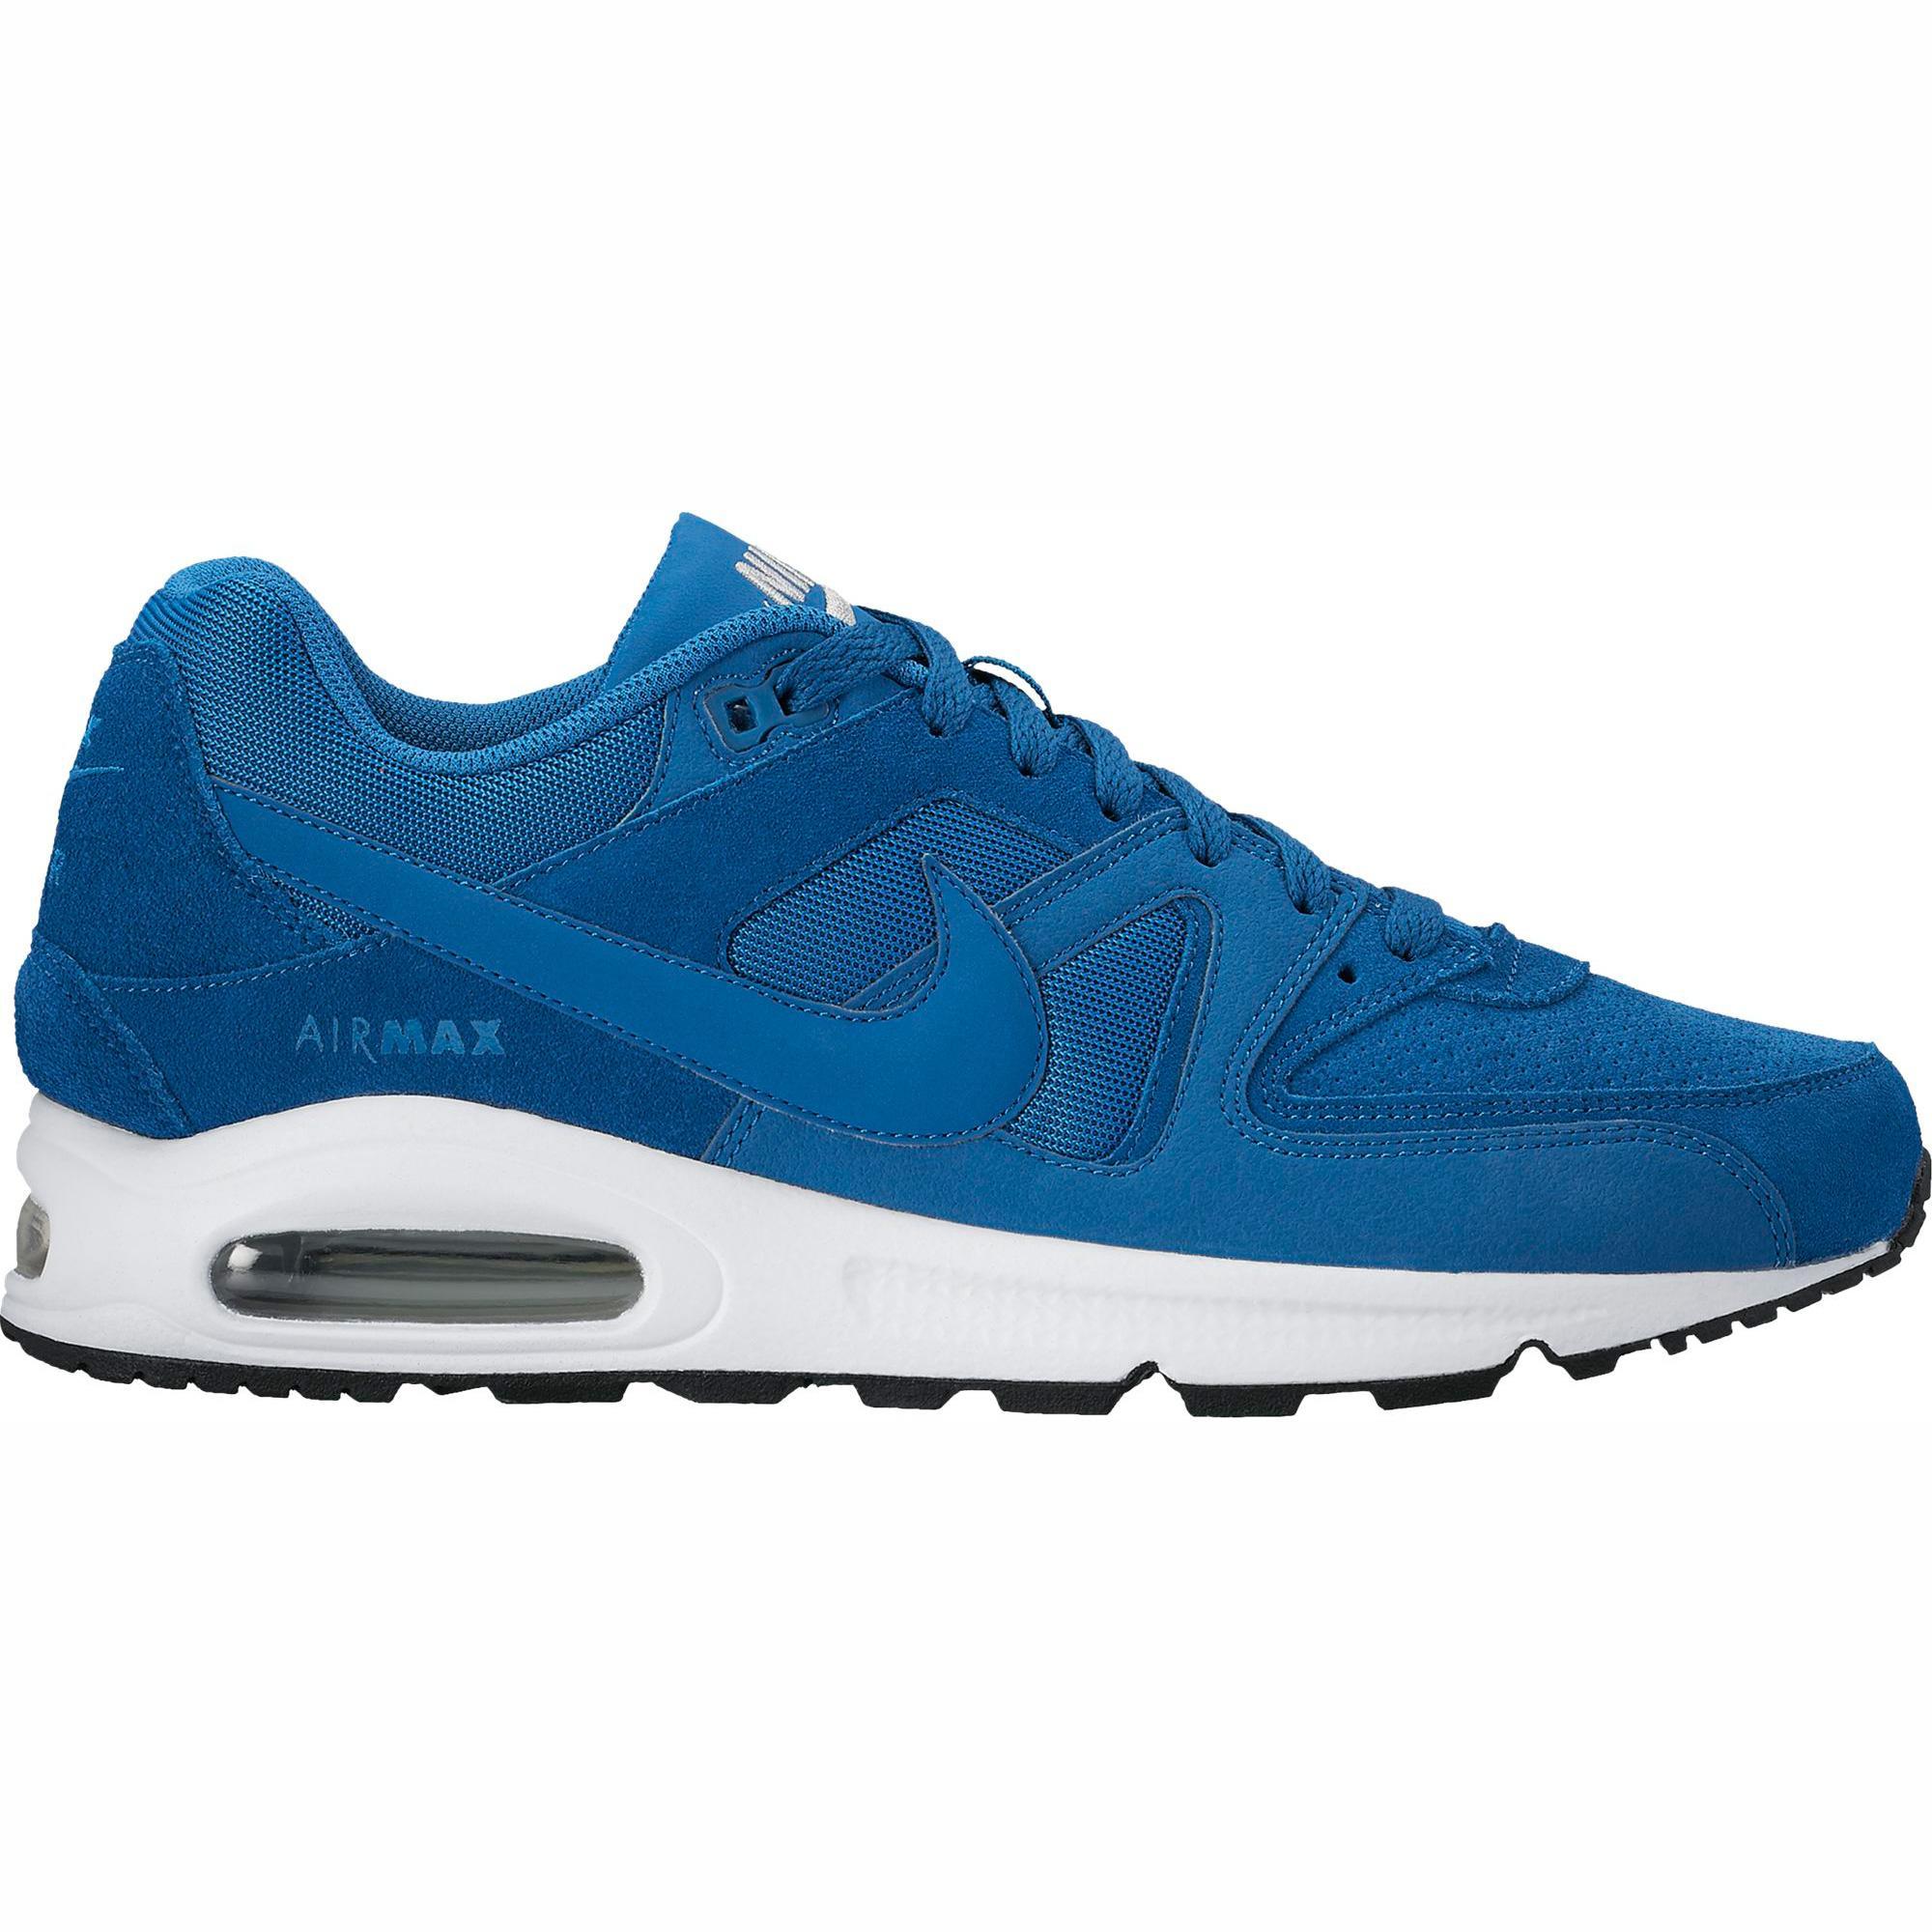 96869320e2 Nike Mens Air Max Command Running Shoes - Industrial Blue - Tennisnuts.com